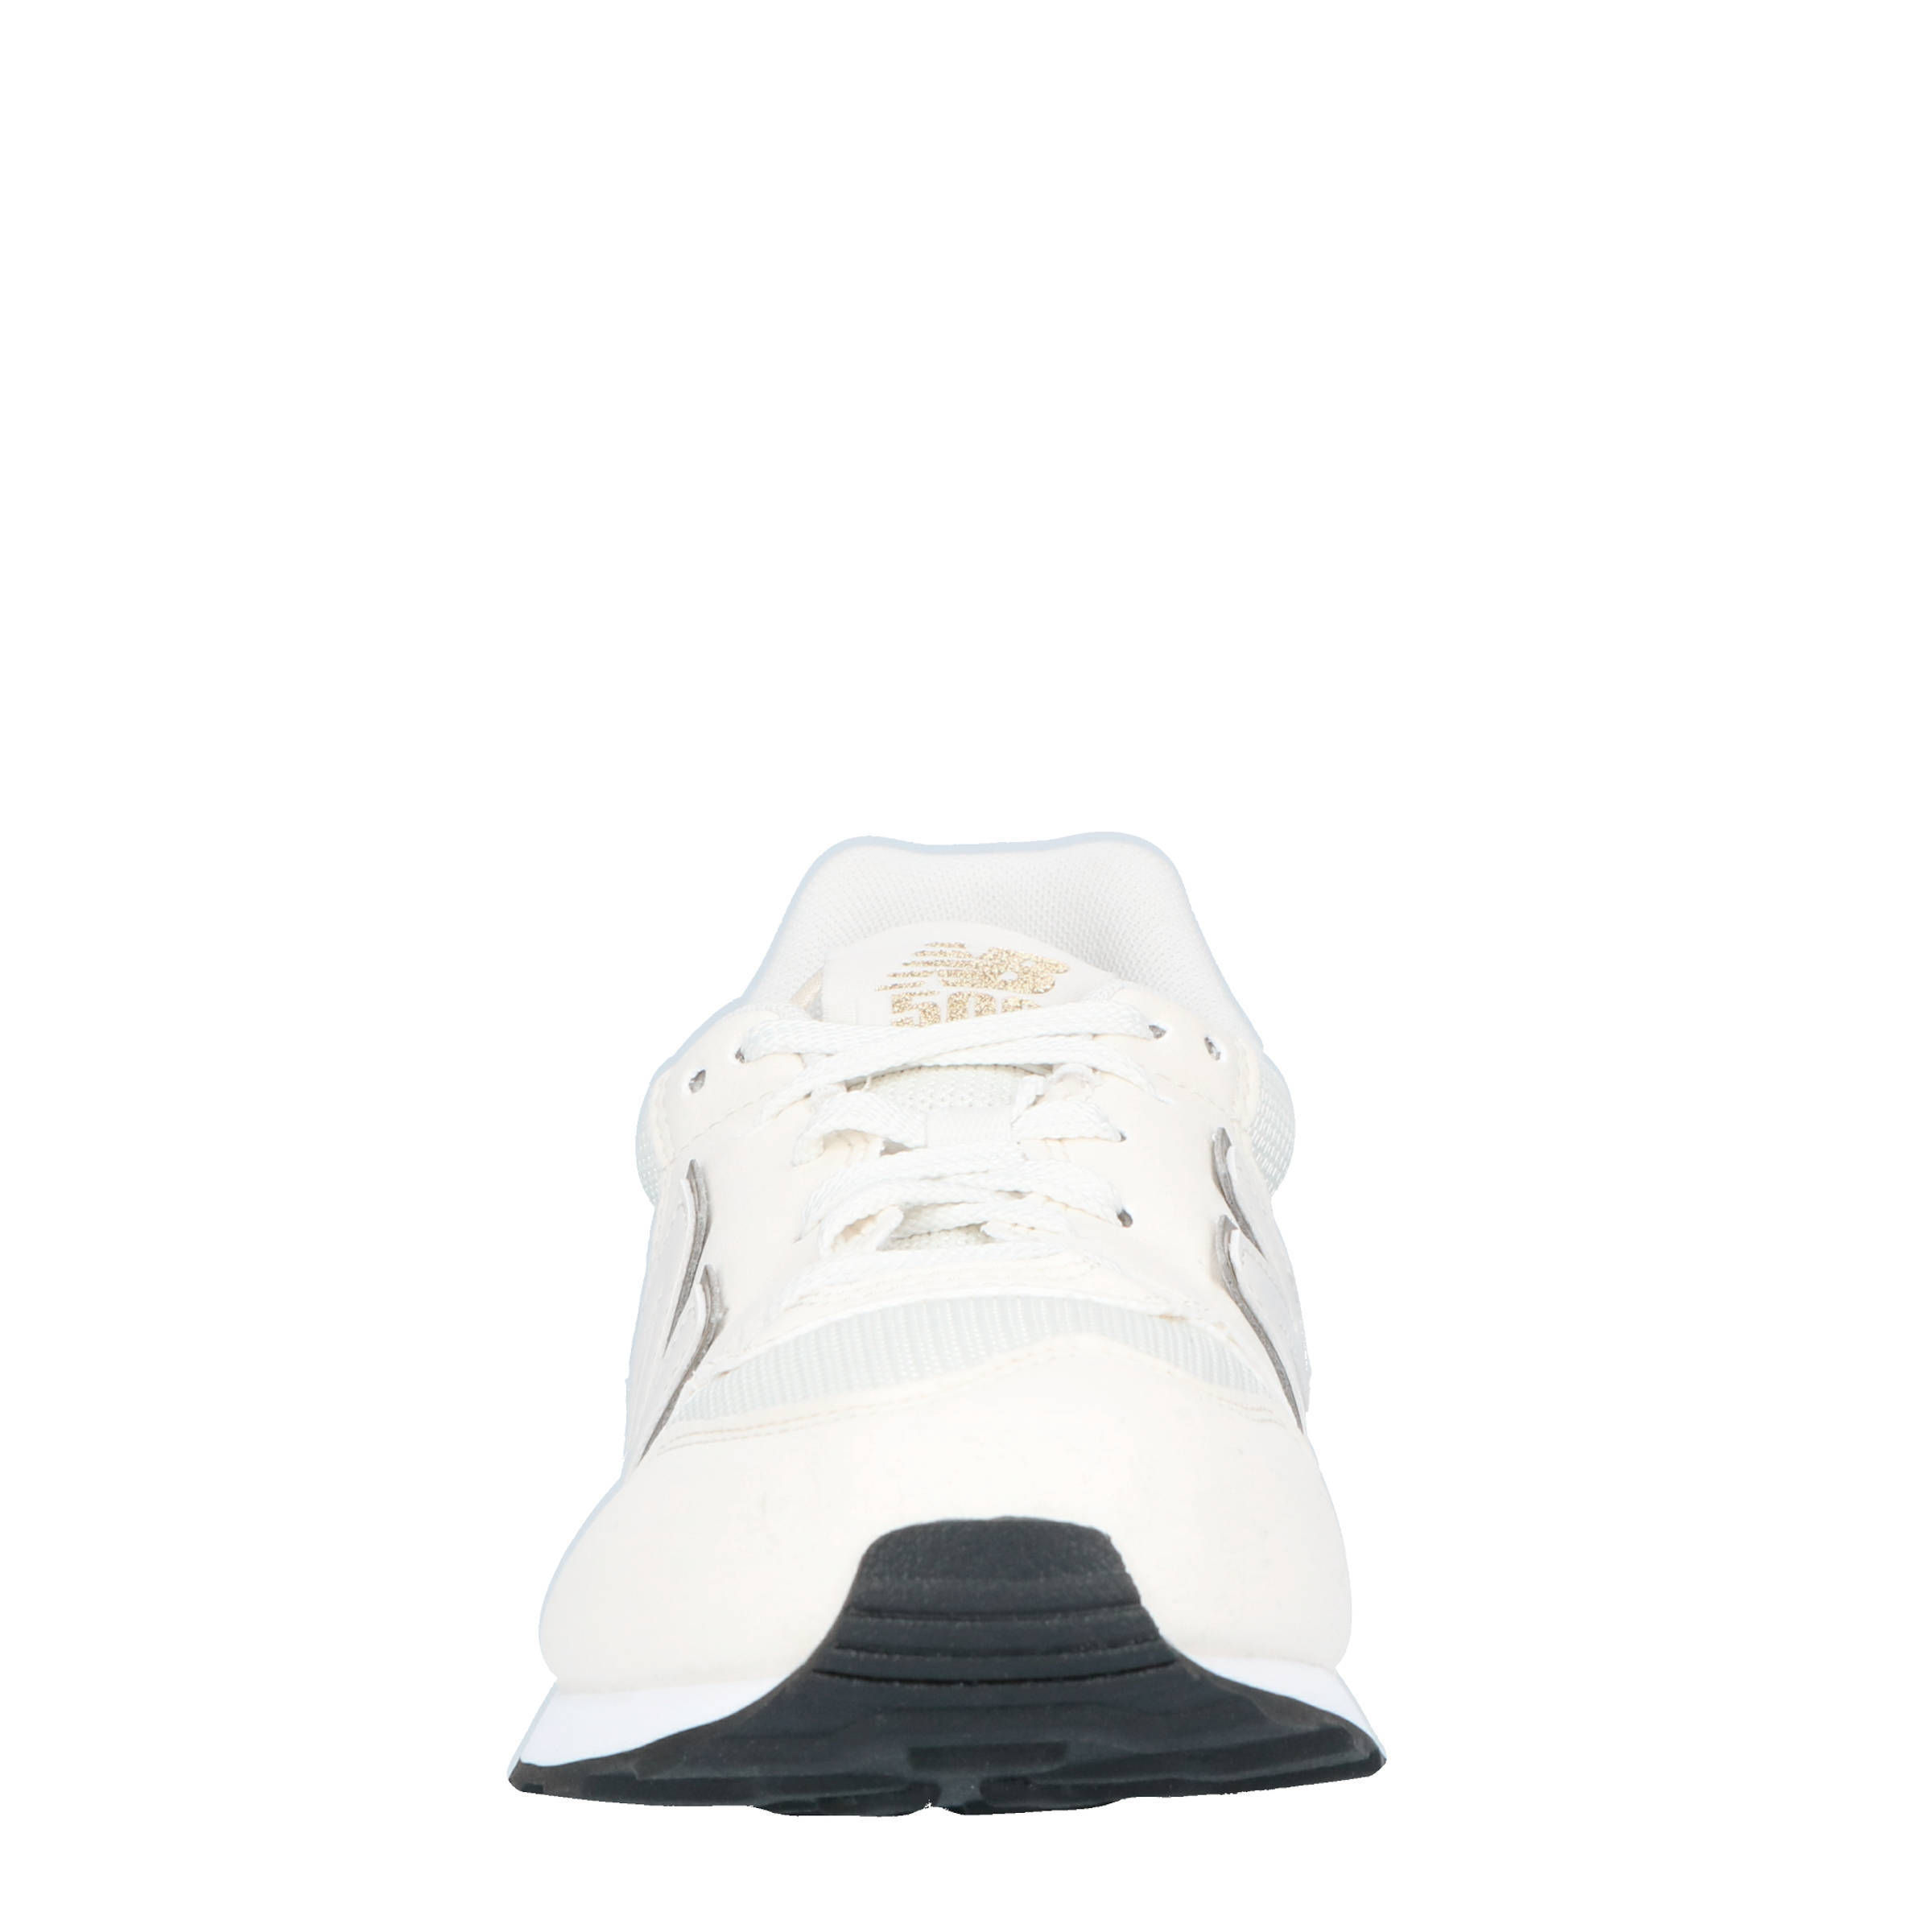 New Balance GW 500 sneakers wit/goud   wehkamp